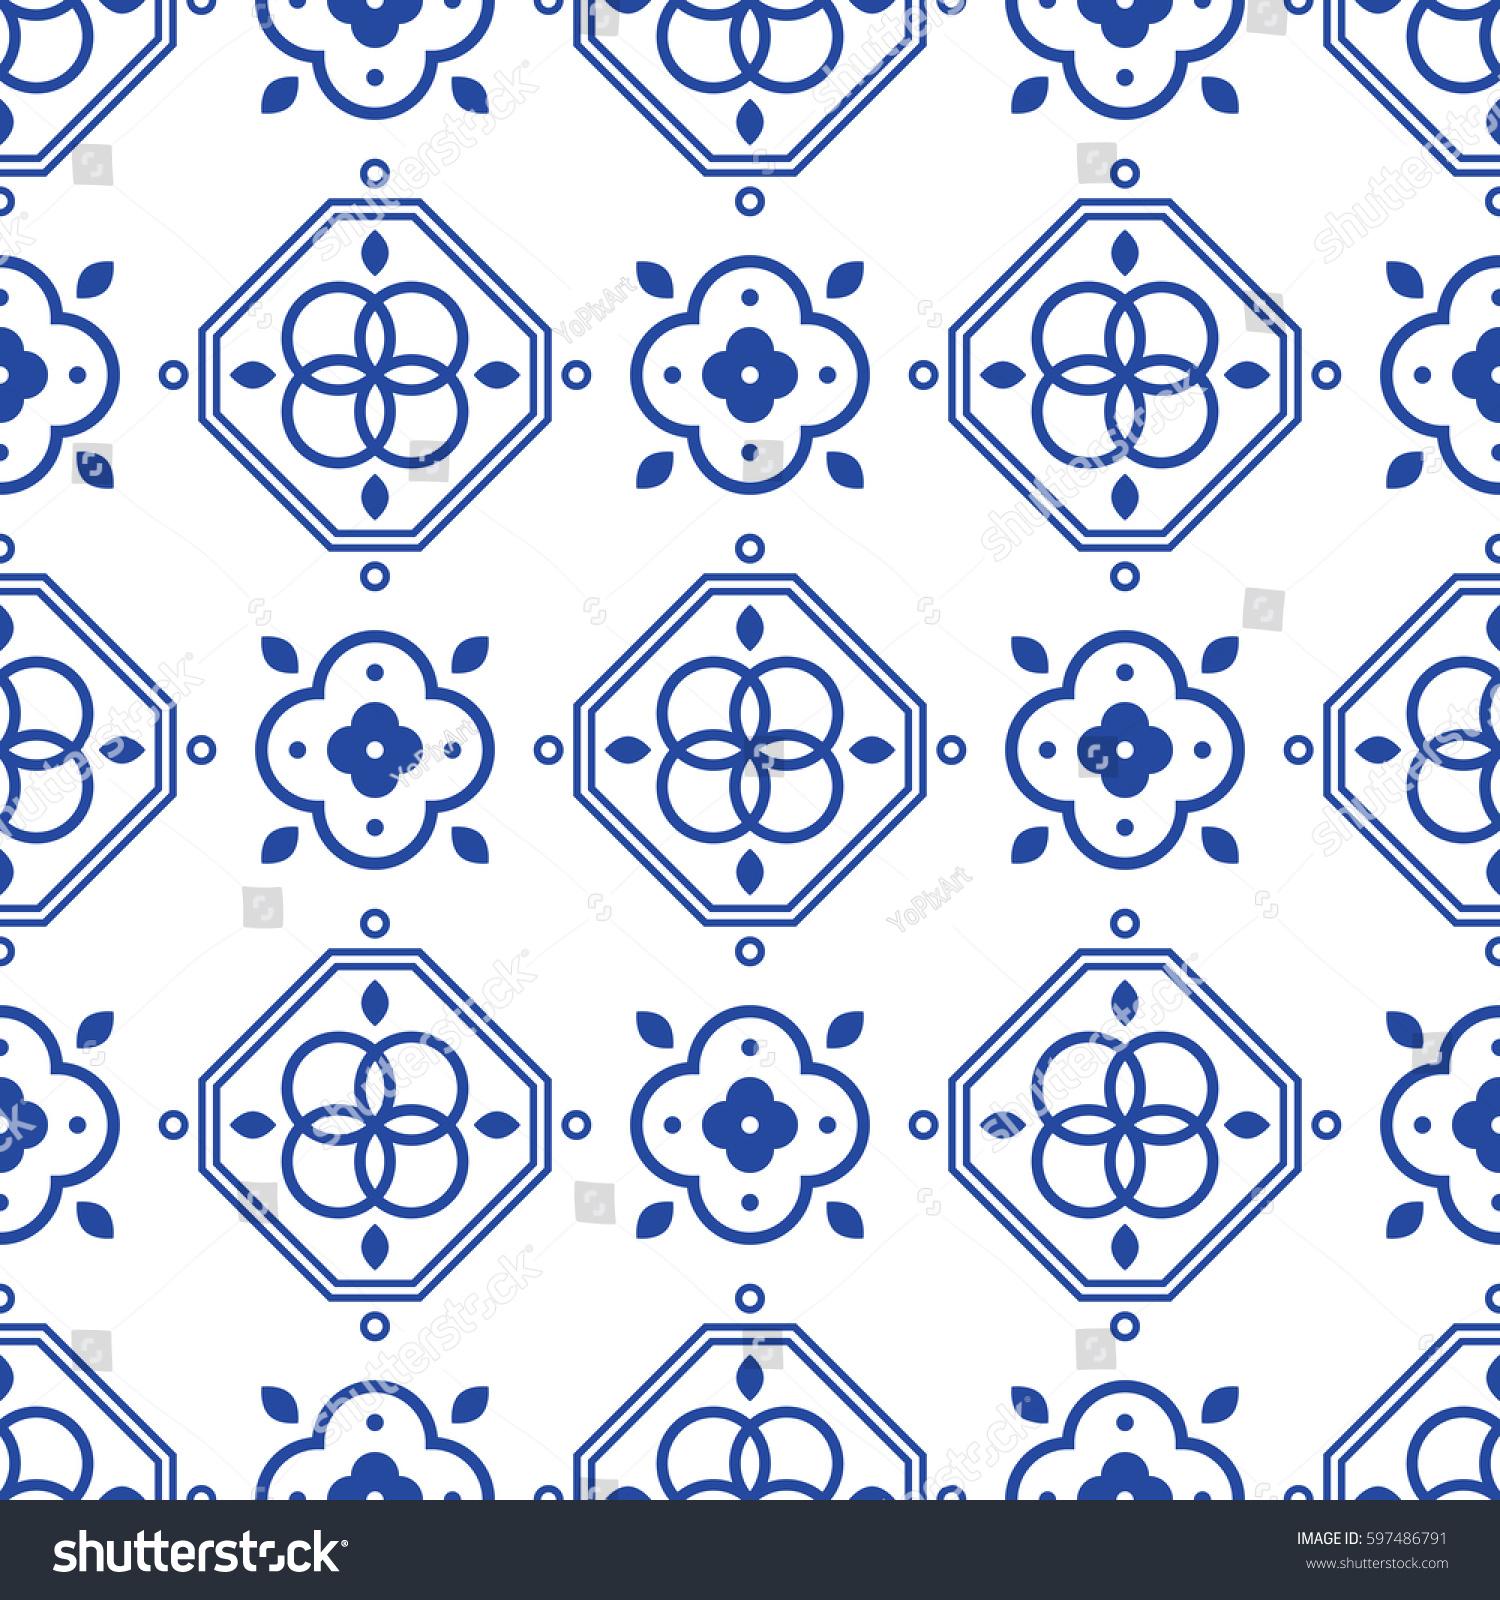 Blue White Portugeese Mediterranean Seamless Tile Stock Vector HD ...